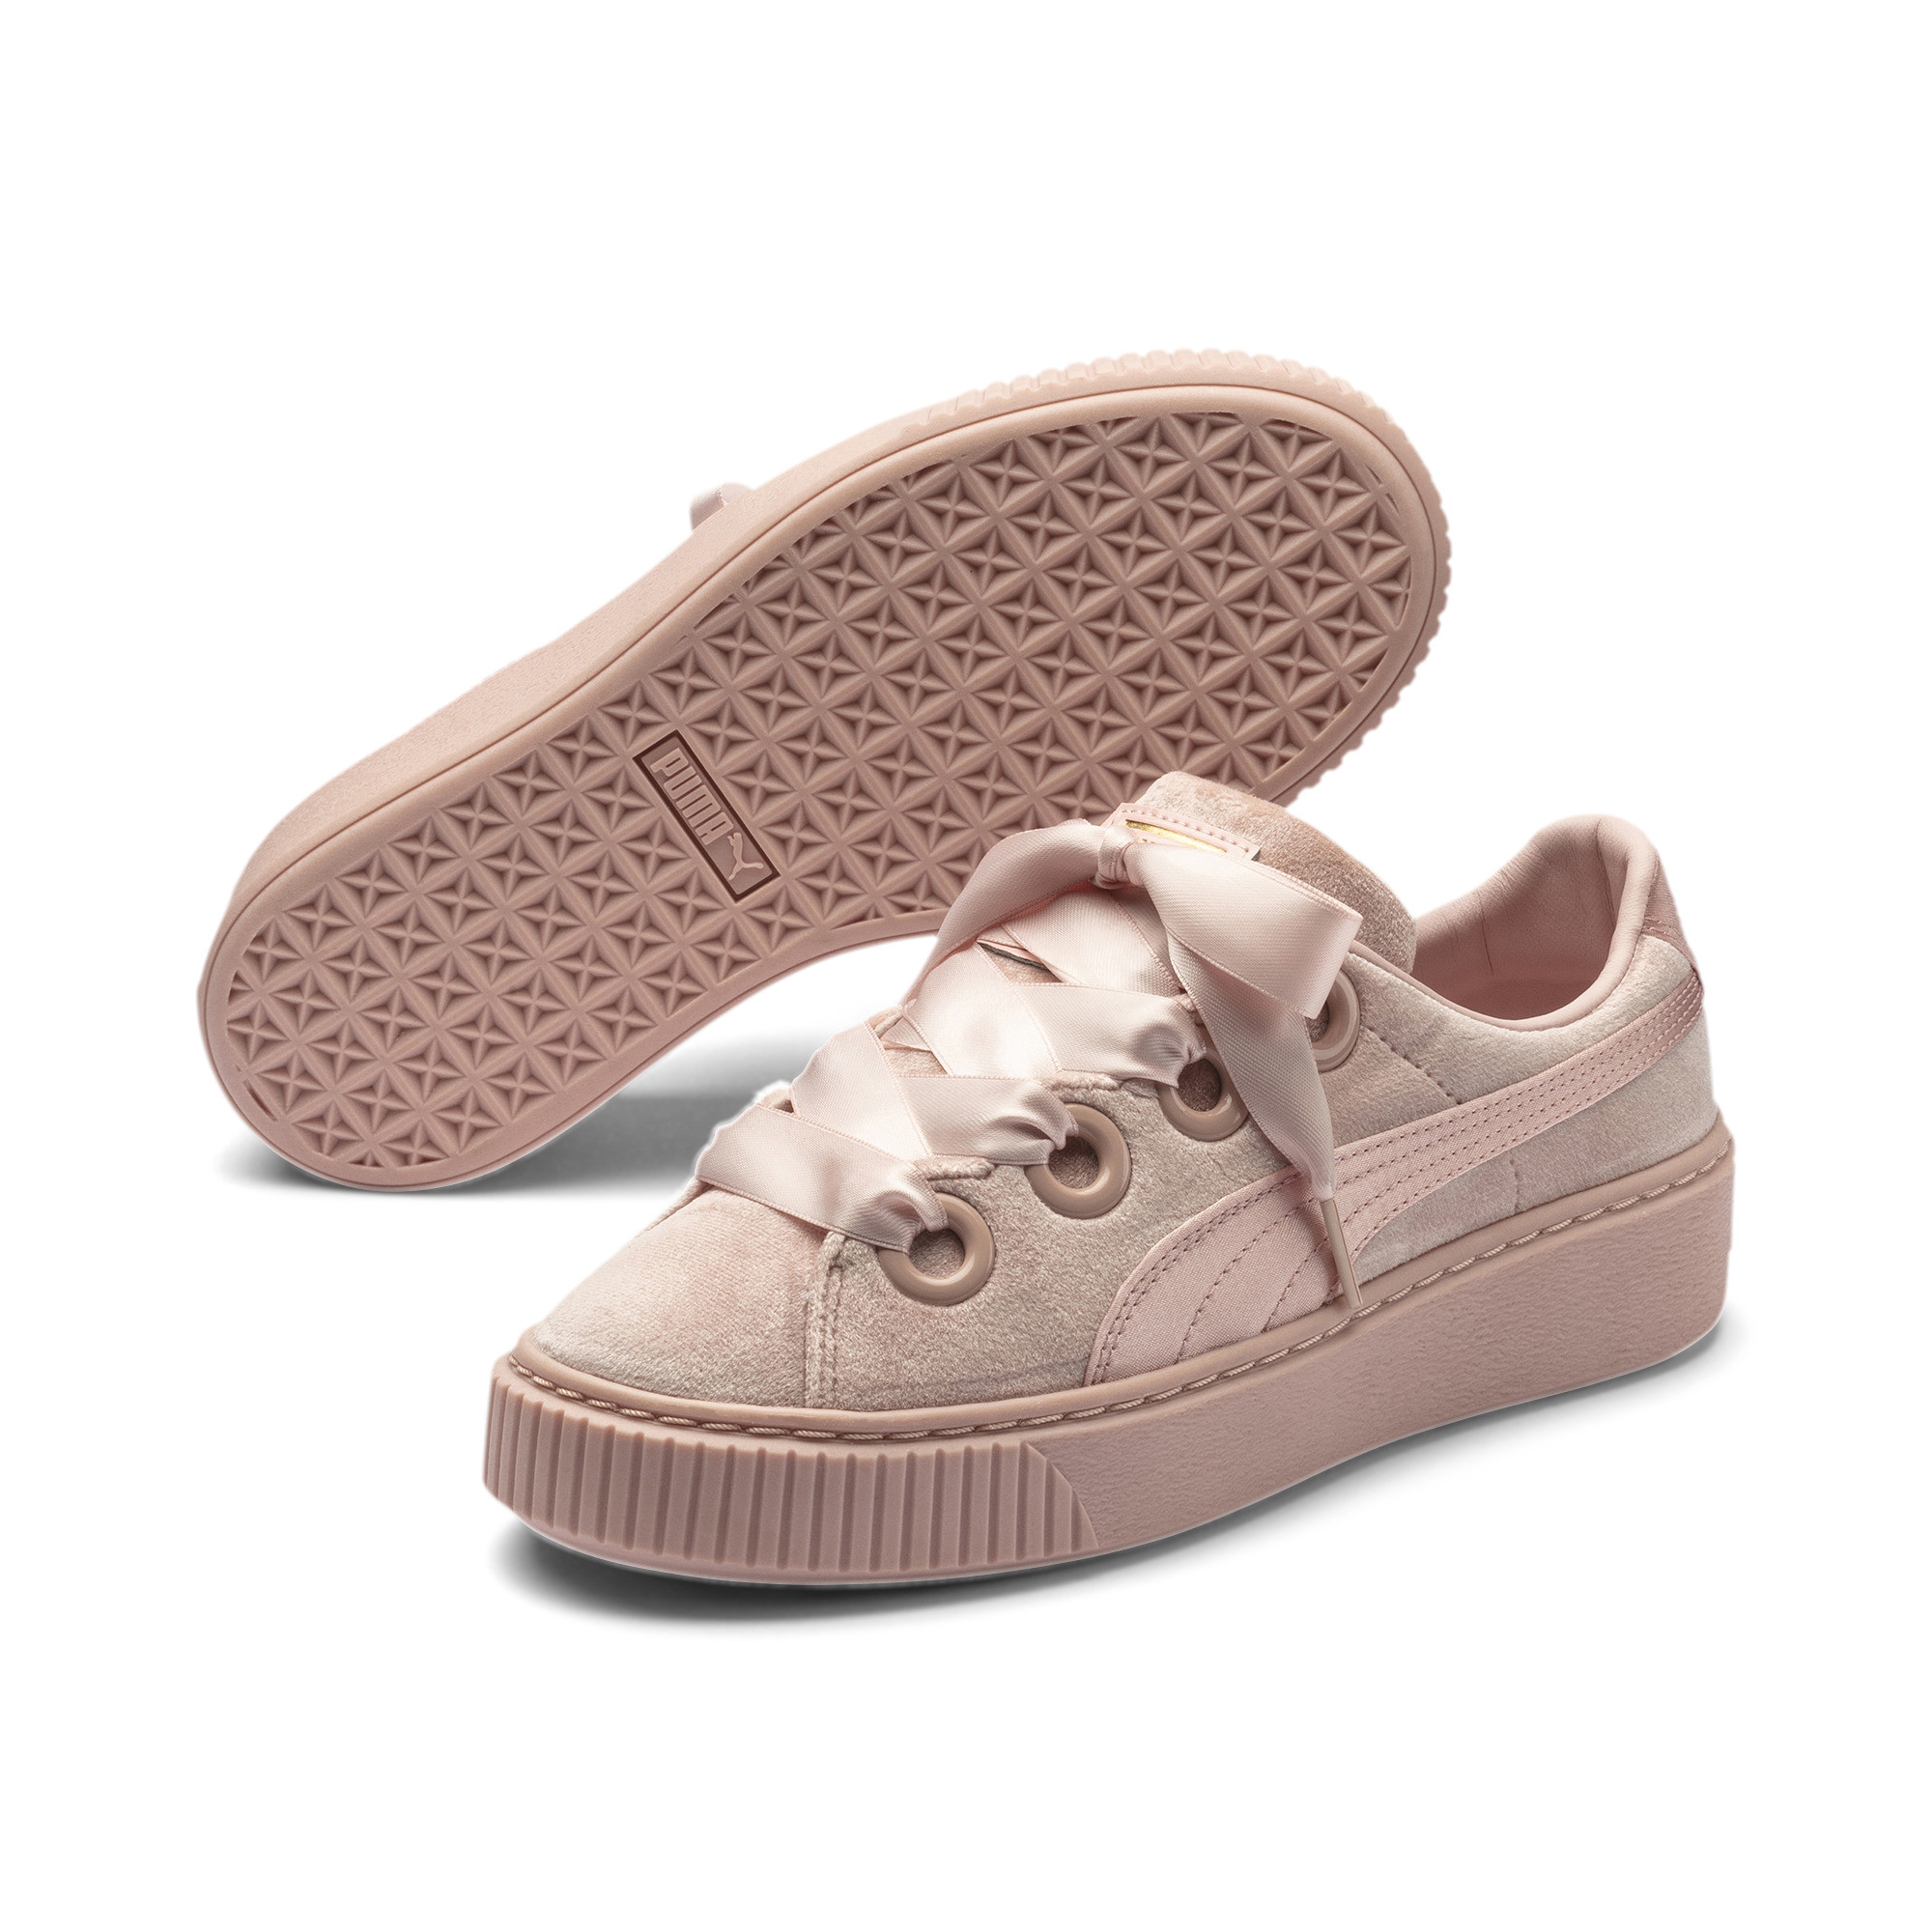 Verschiedenes Mode Schuhe Online Shop : Puma Sparen Damen